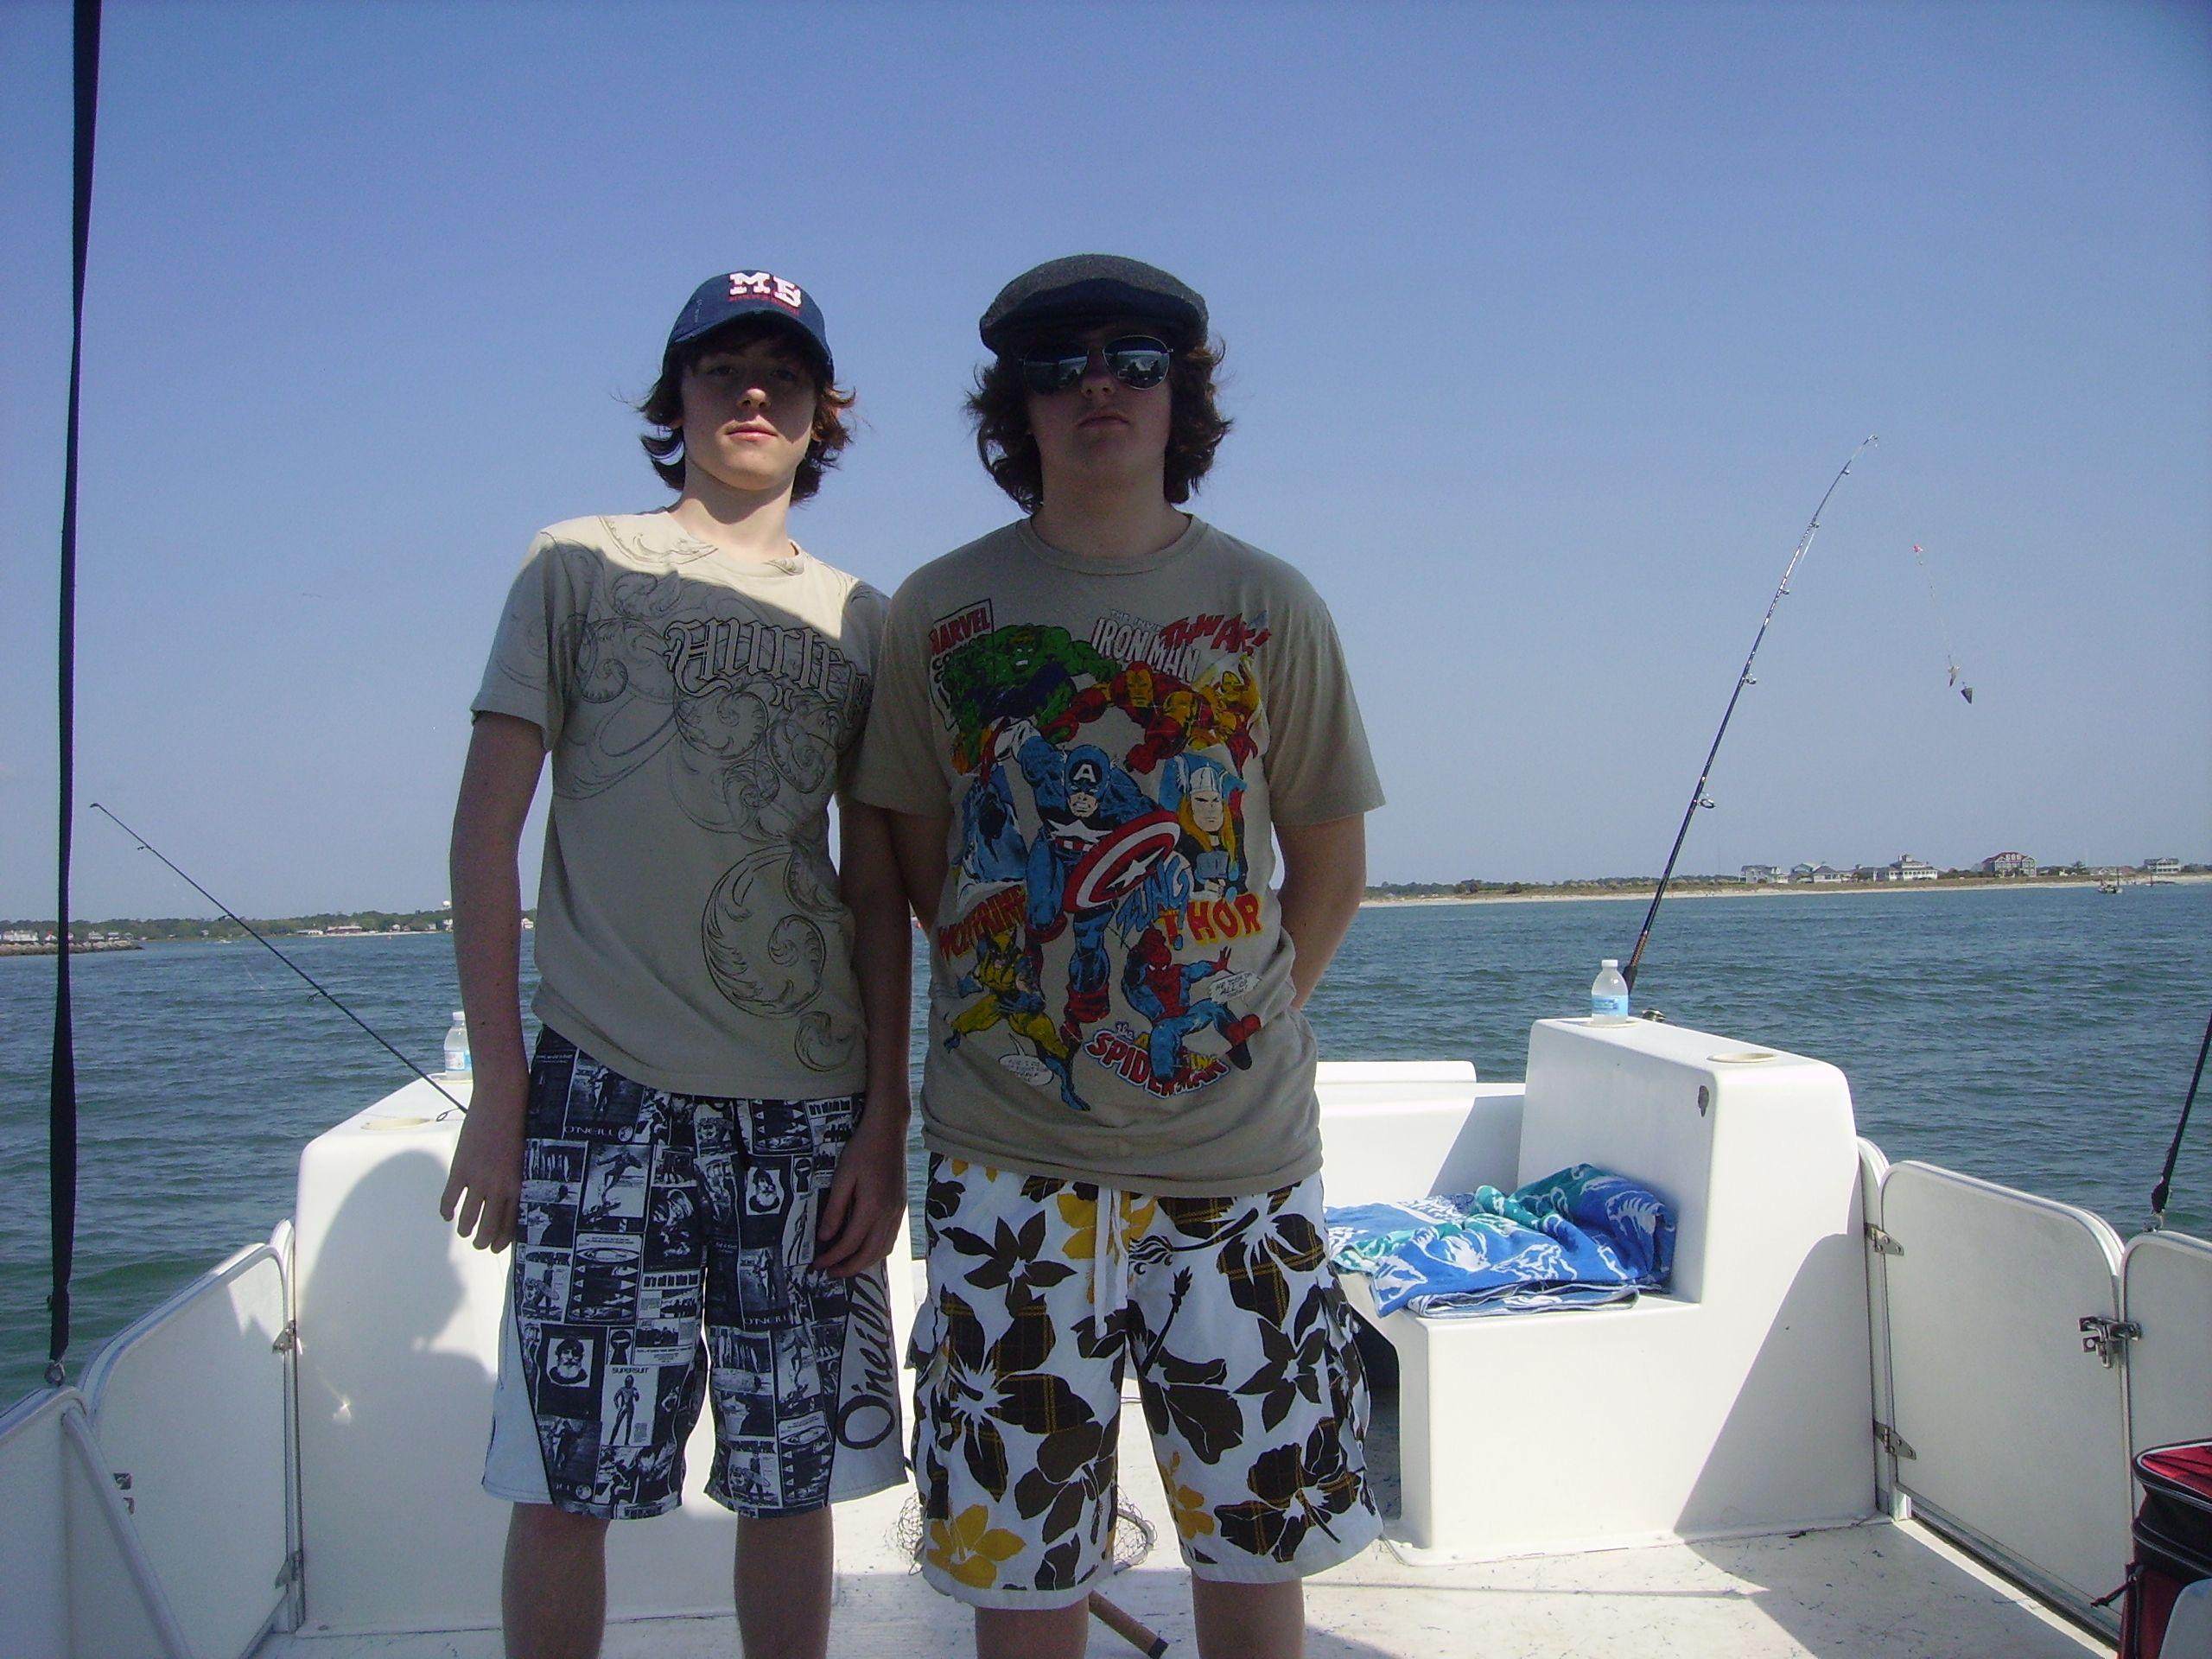 Fishing is a fun way to enjoy the day httpwwwhomeaway